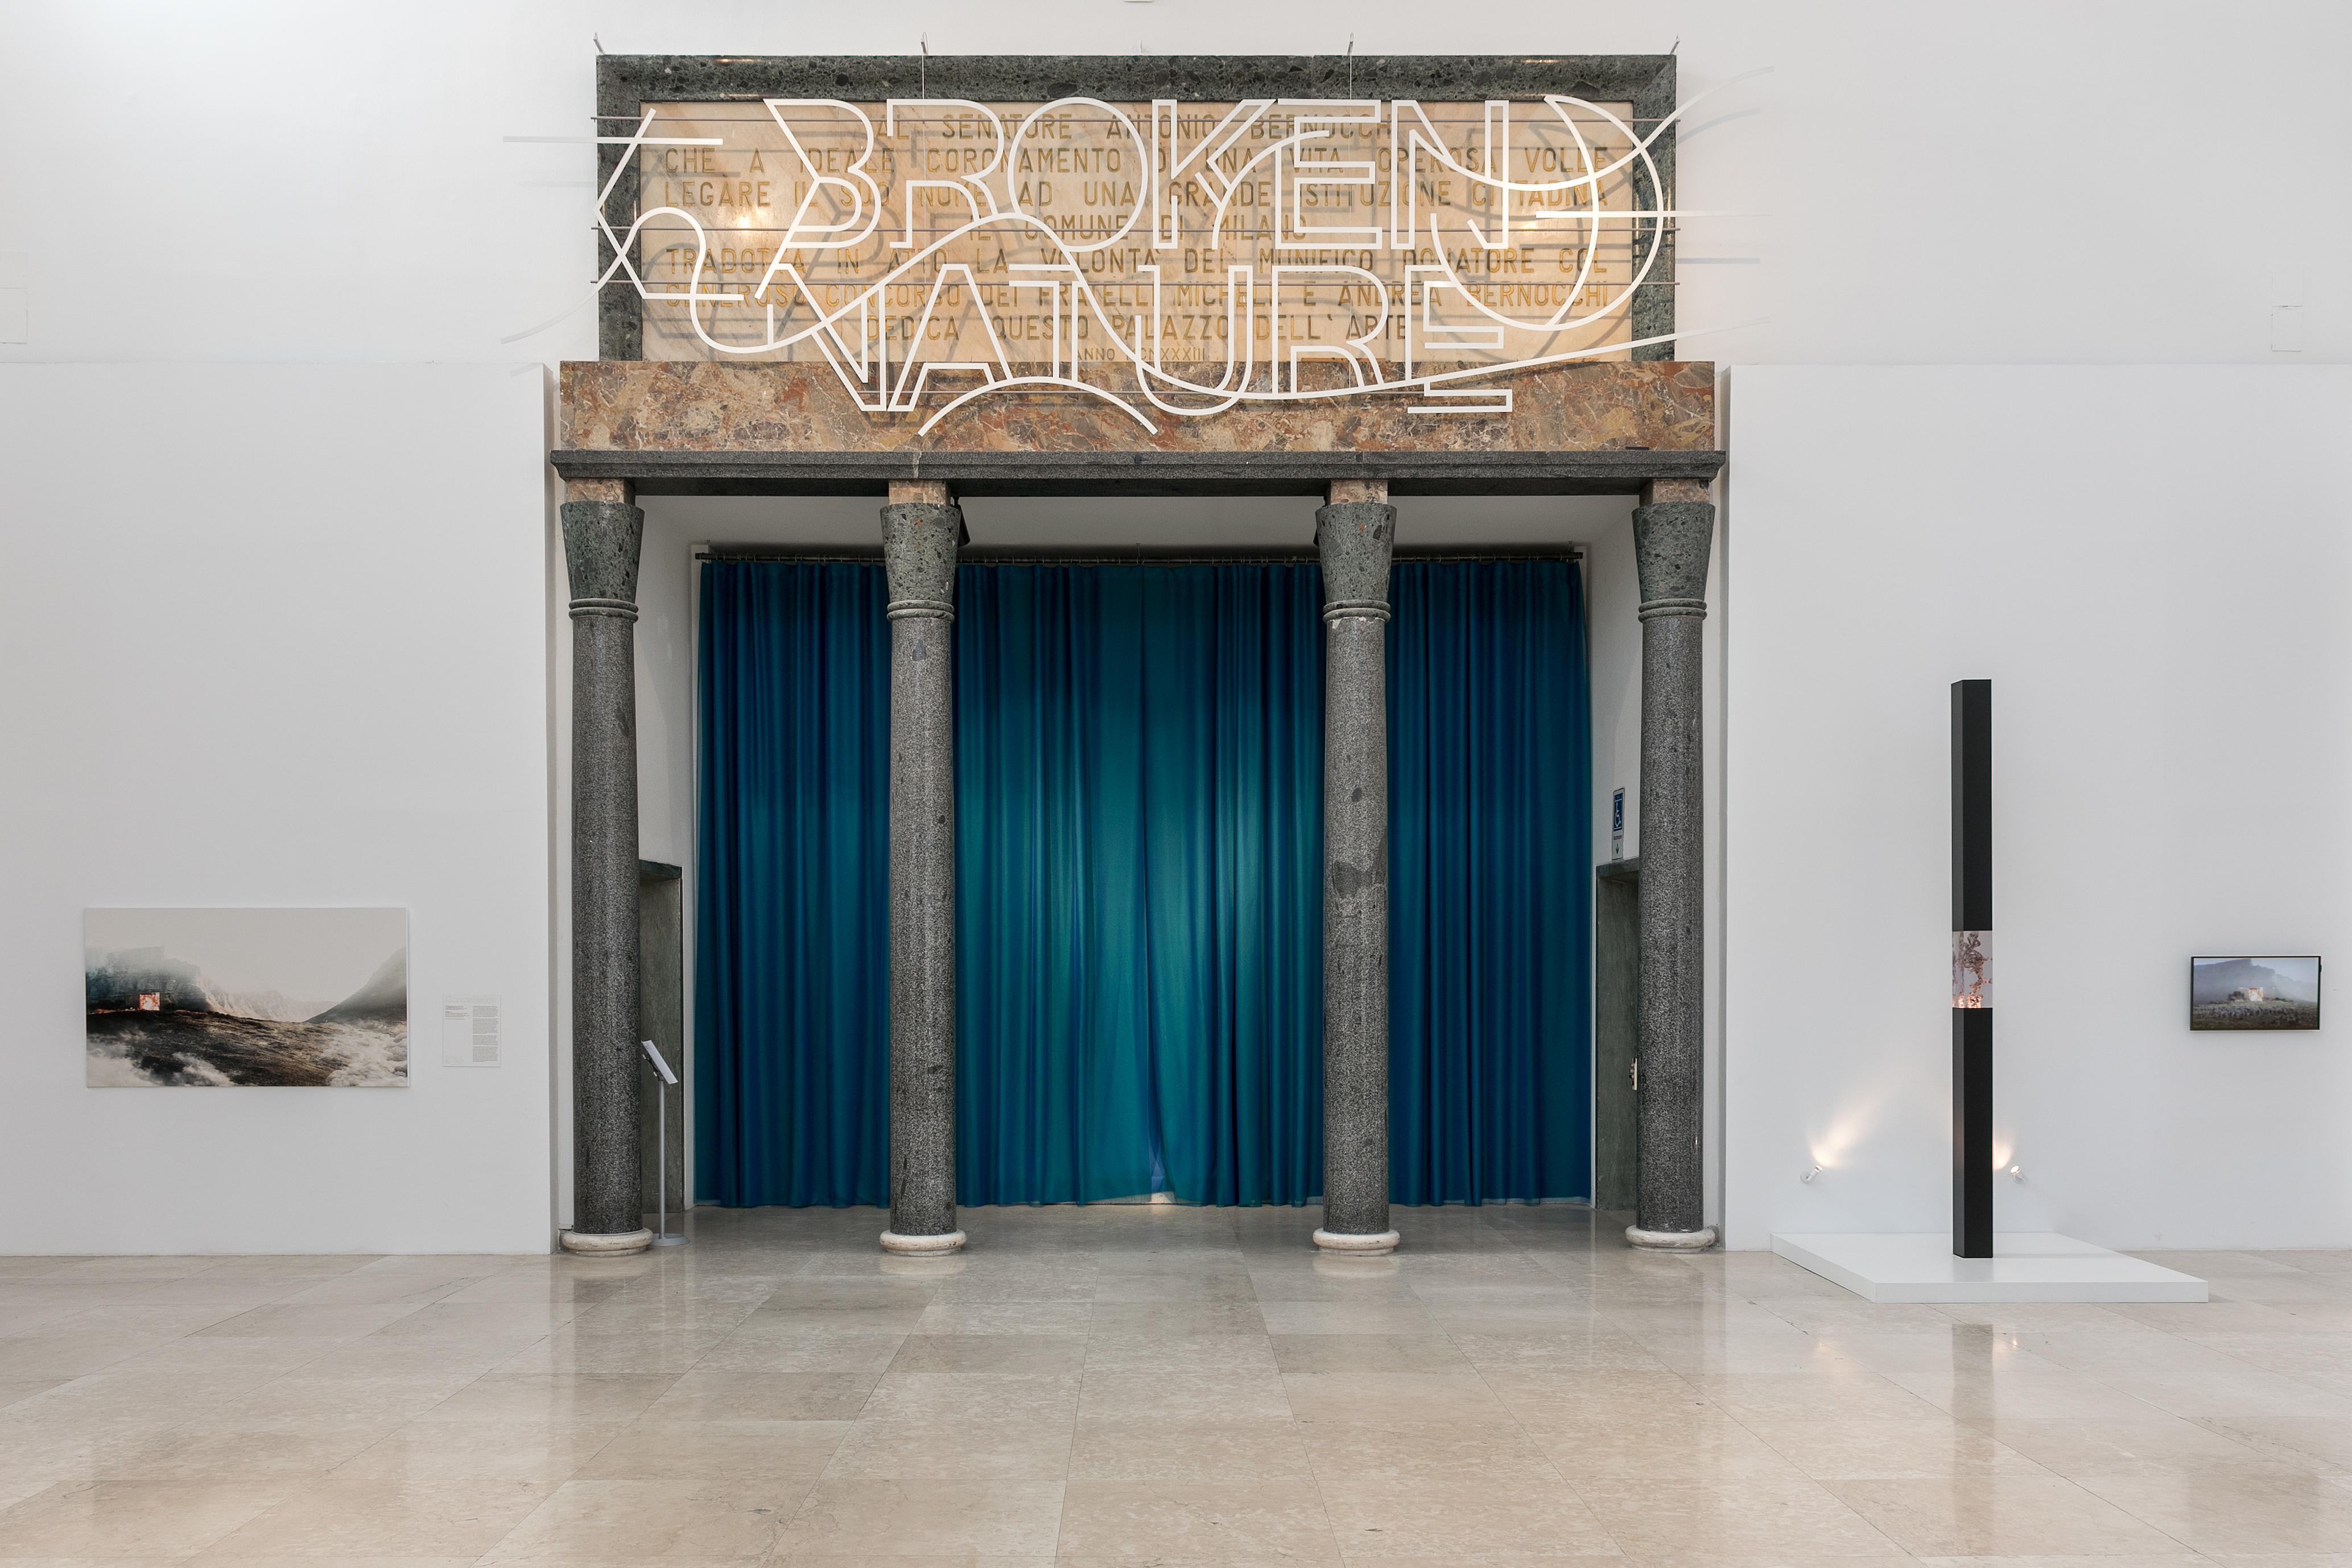 Entrance of the Broken Nature exhibition.